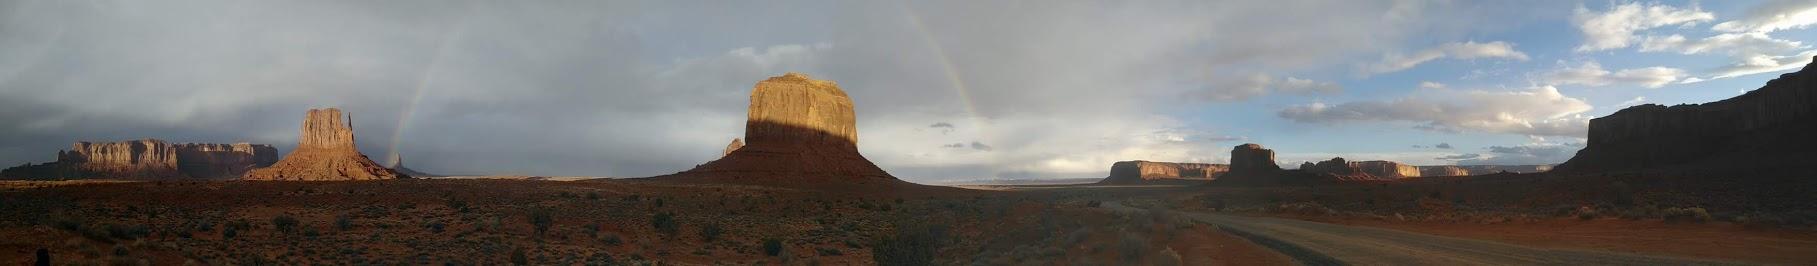 PHOTO_20181122_162430moument rainbow.jpg